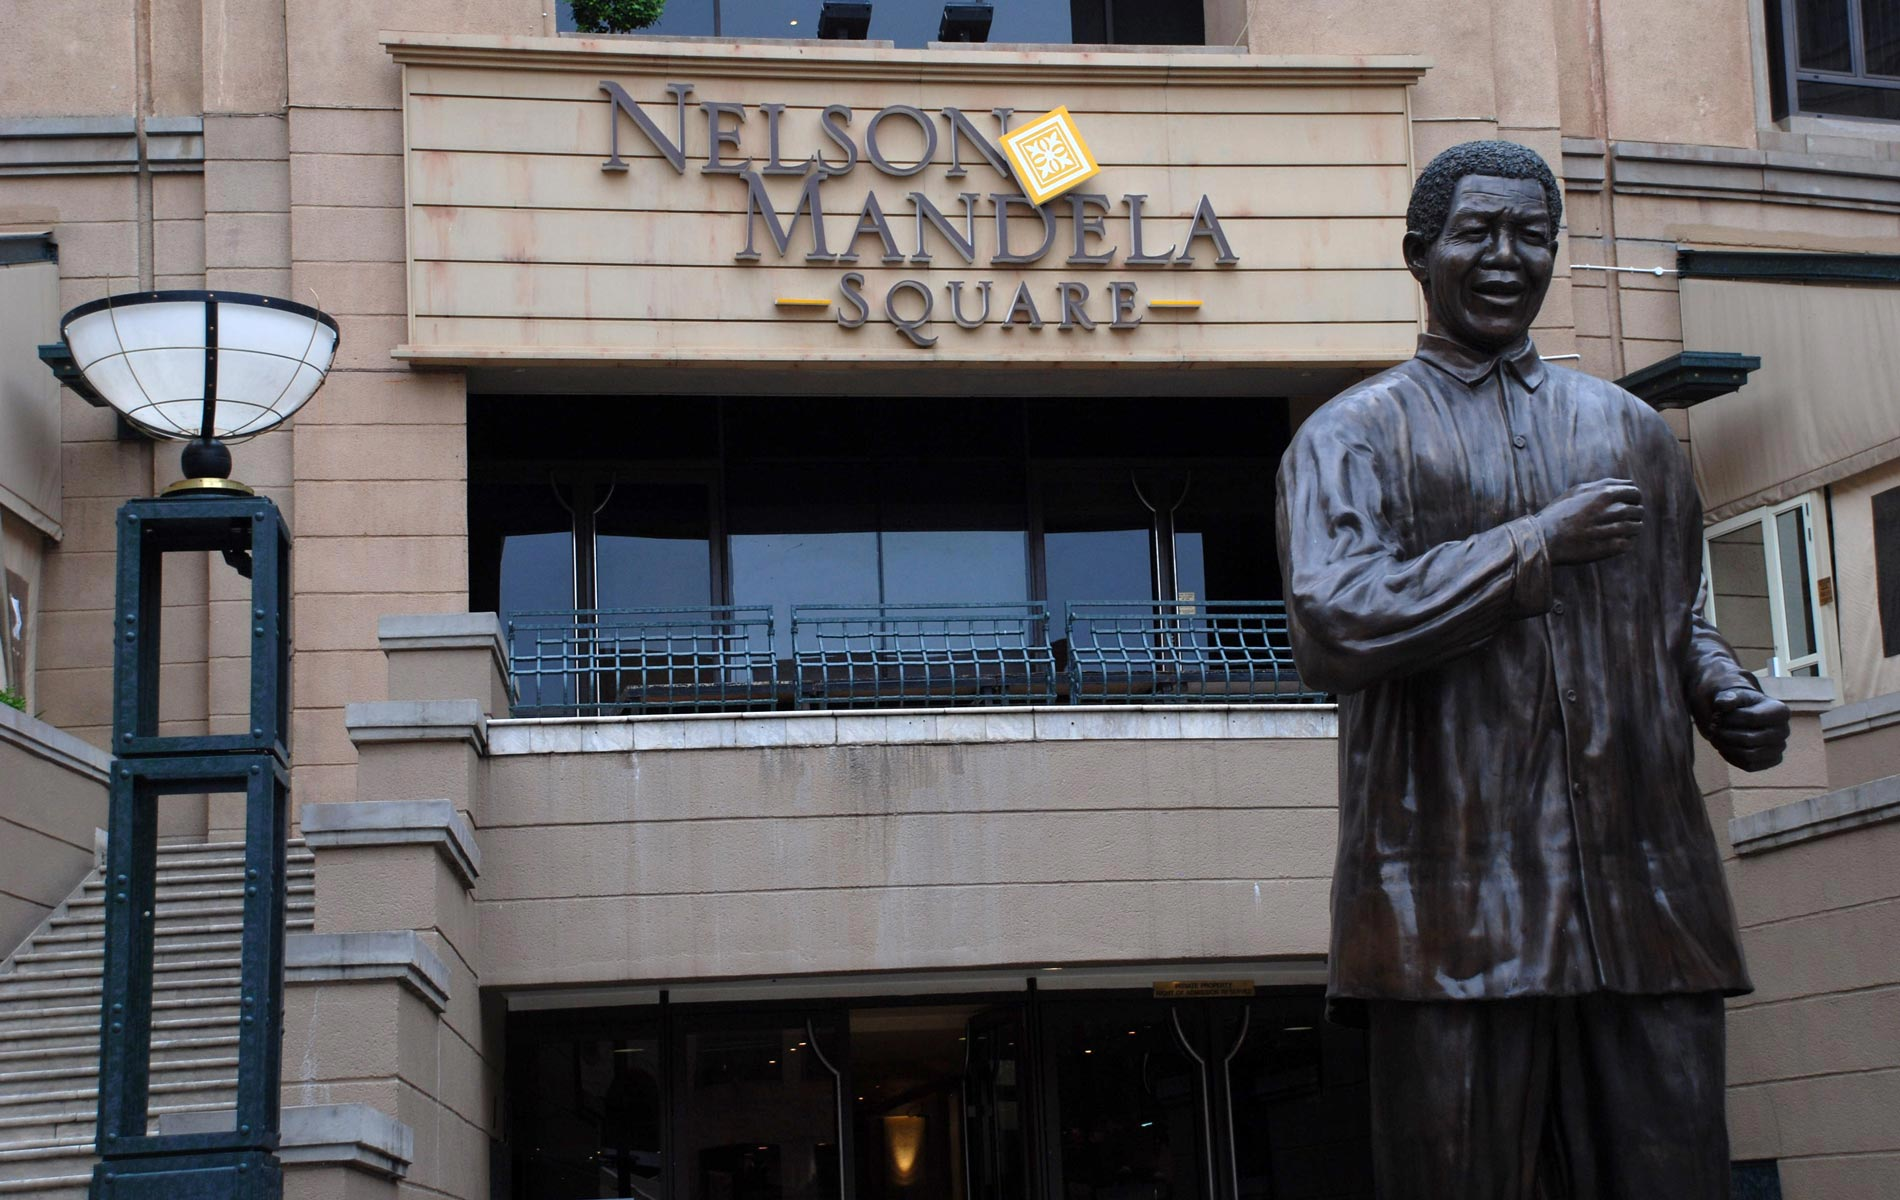 SOUTHAFRICA - Johannesburg_N.Mandela-Square - © Graziano Villa